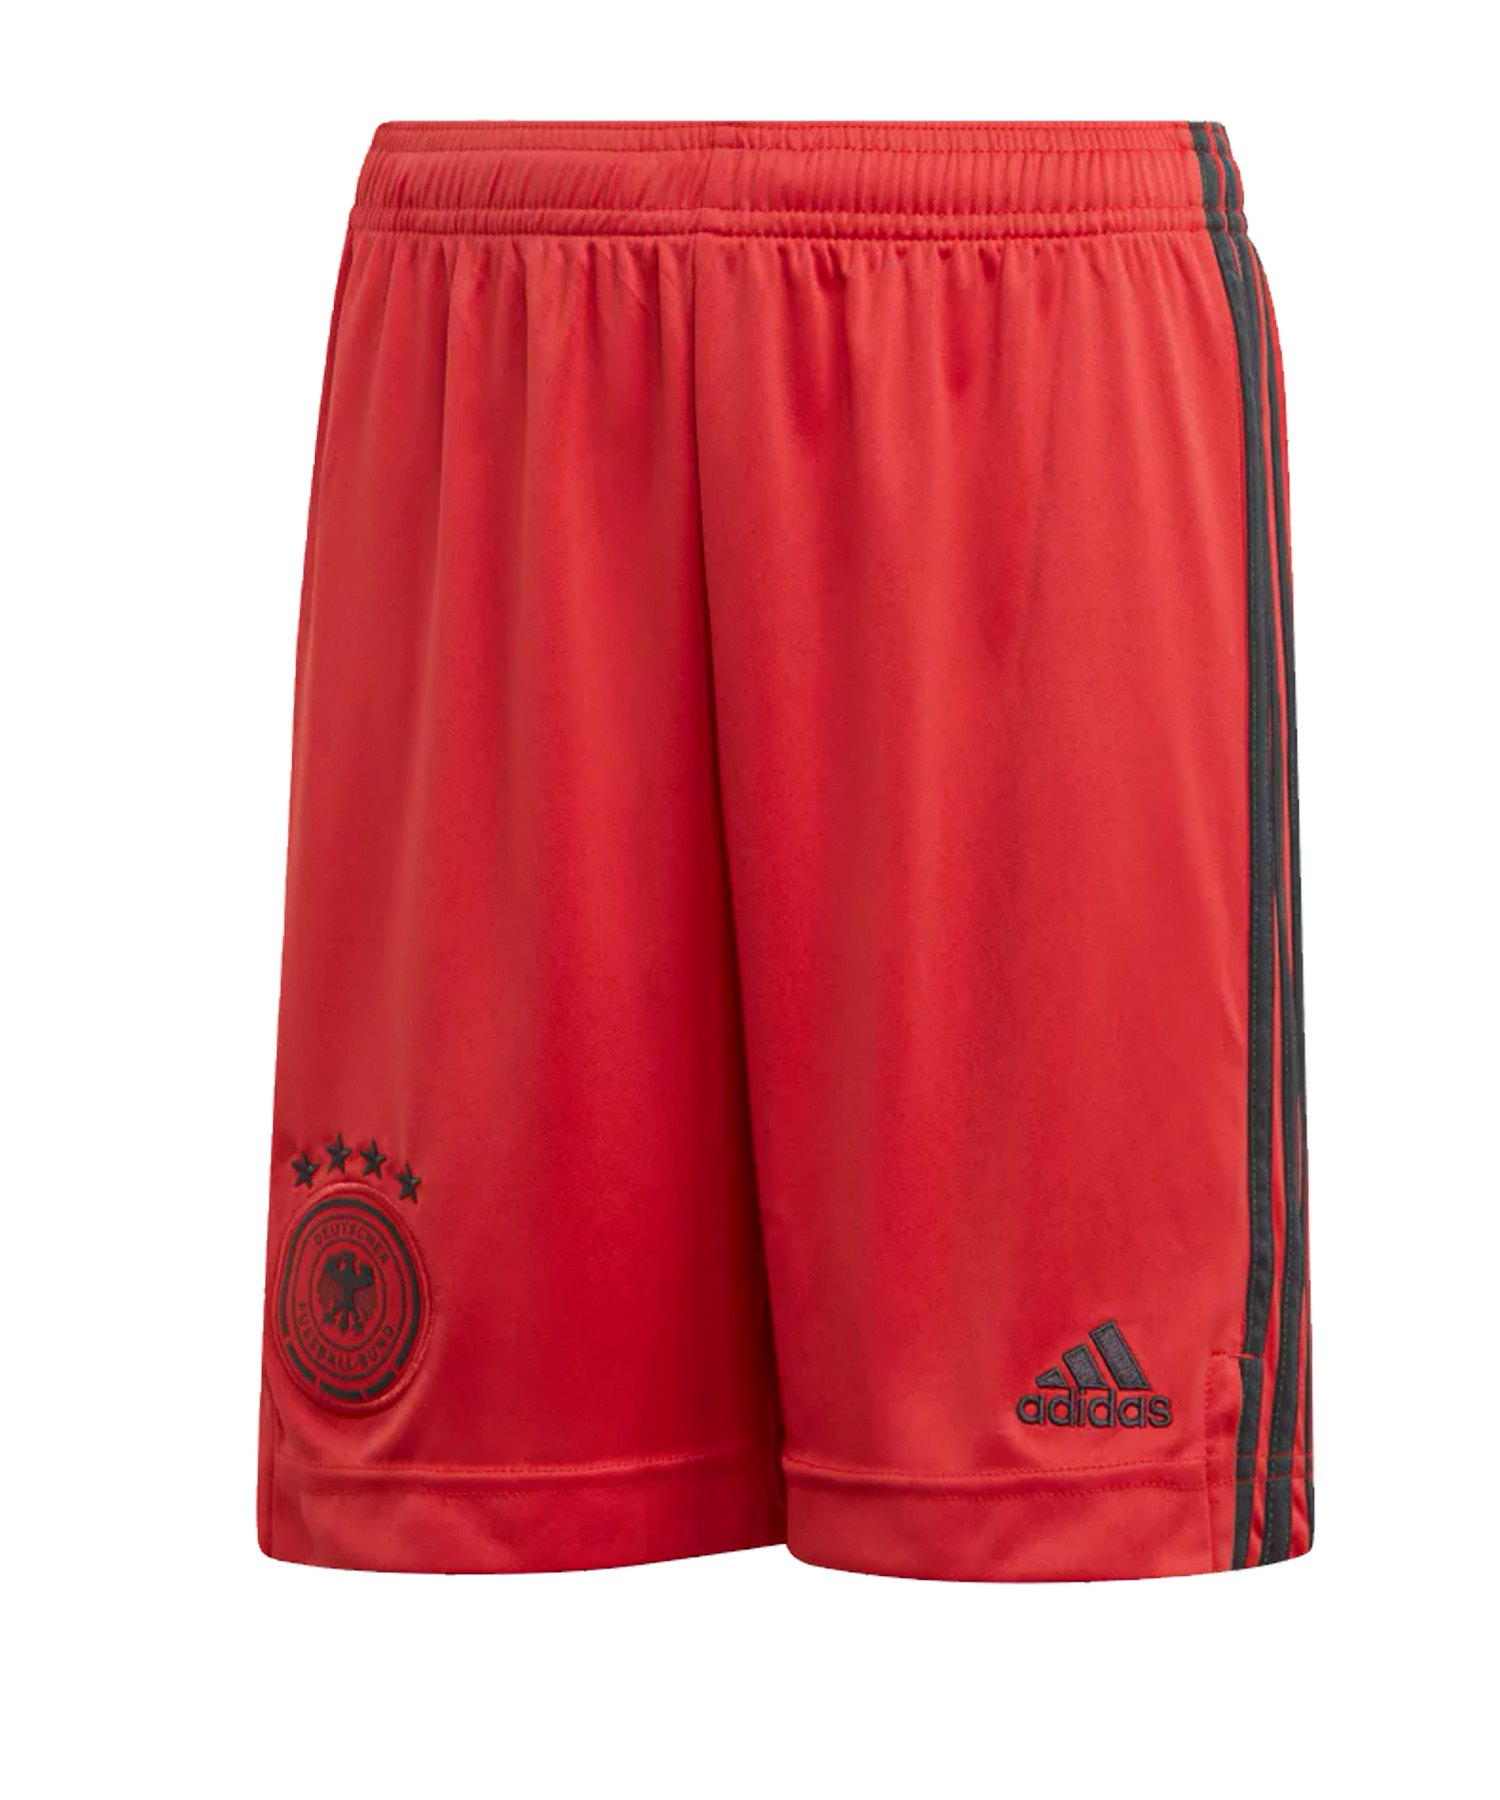 adidas DFB Deutschland TW-Short EM 2020 Rot - rot